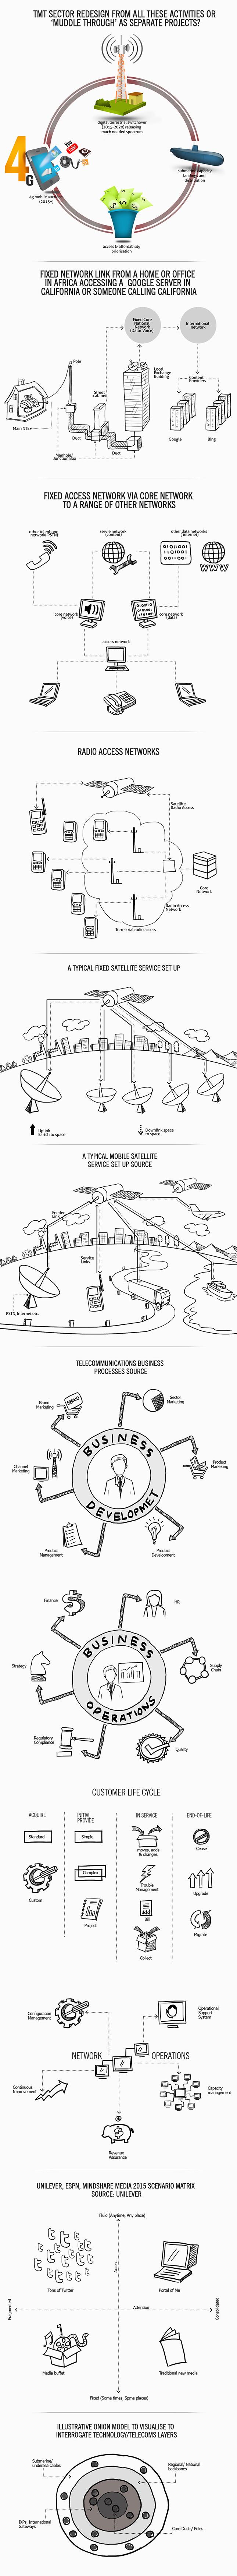 business-on-telecommunication-network_53161a3878354